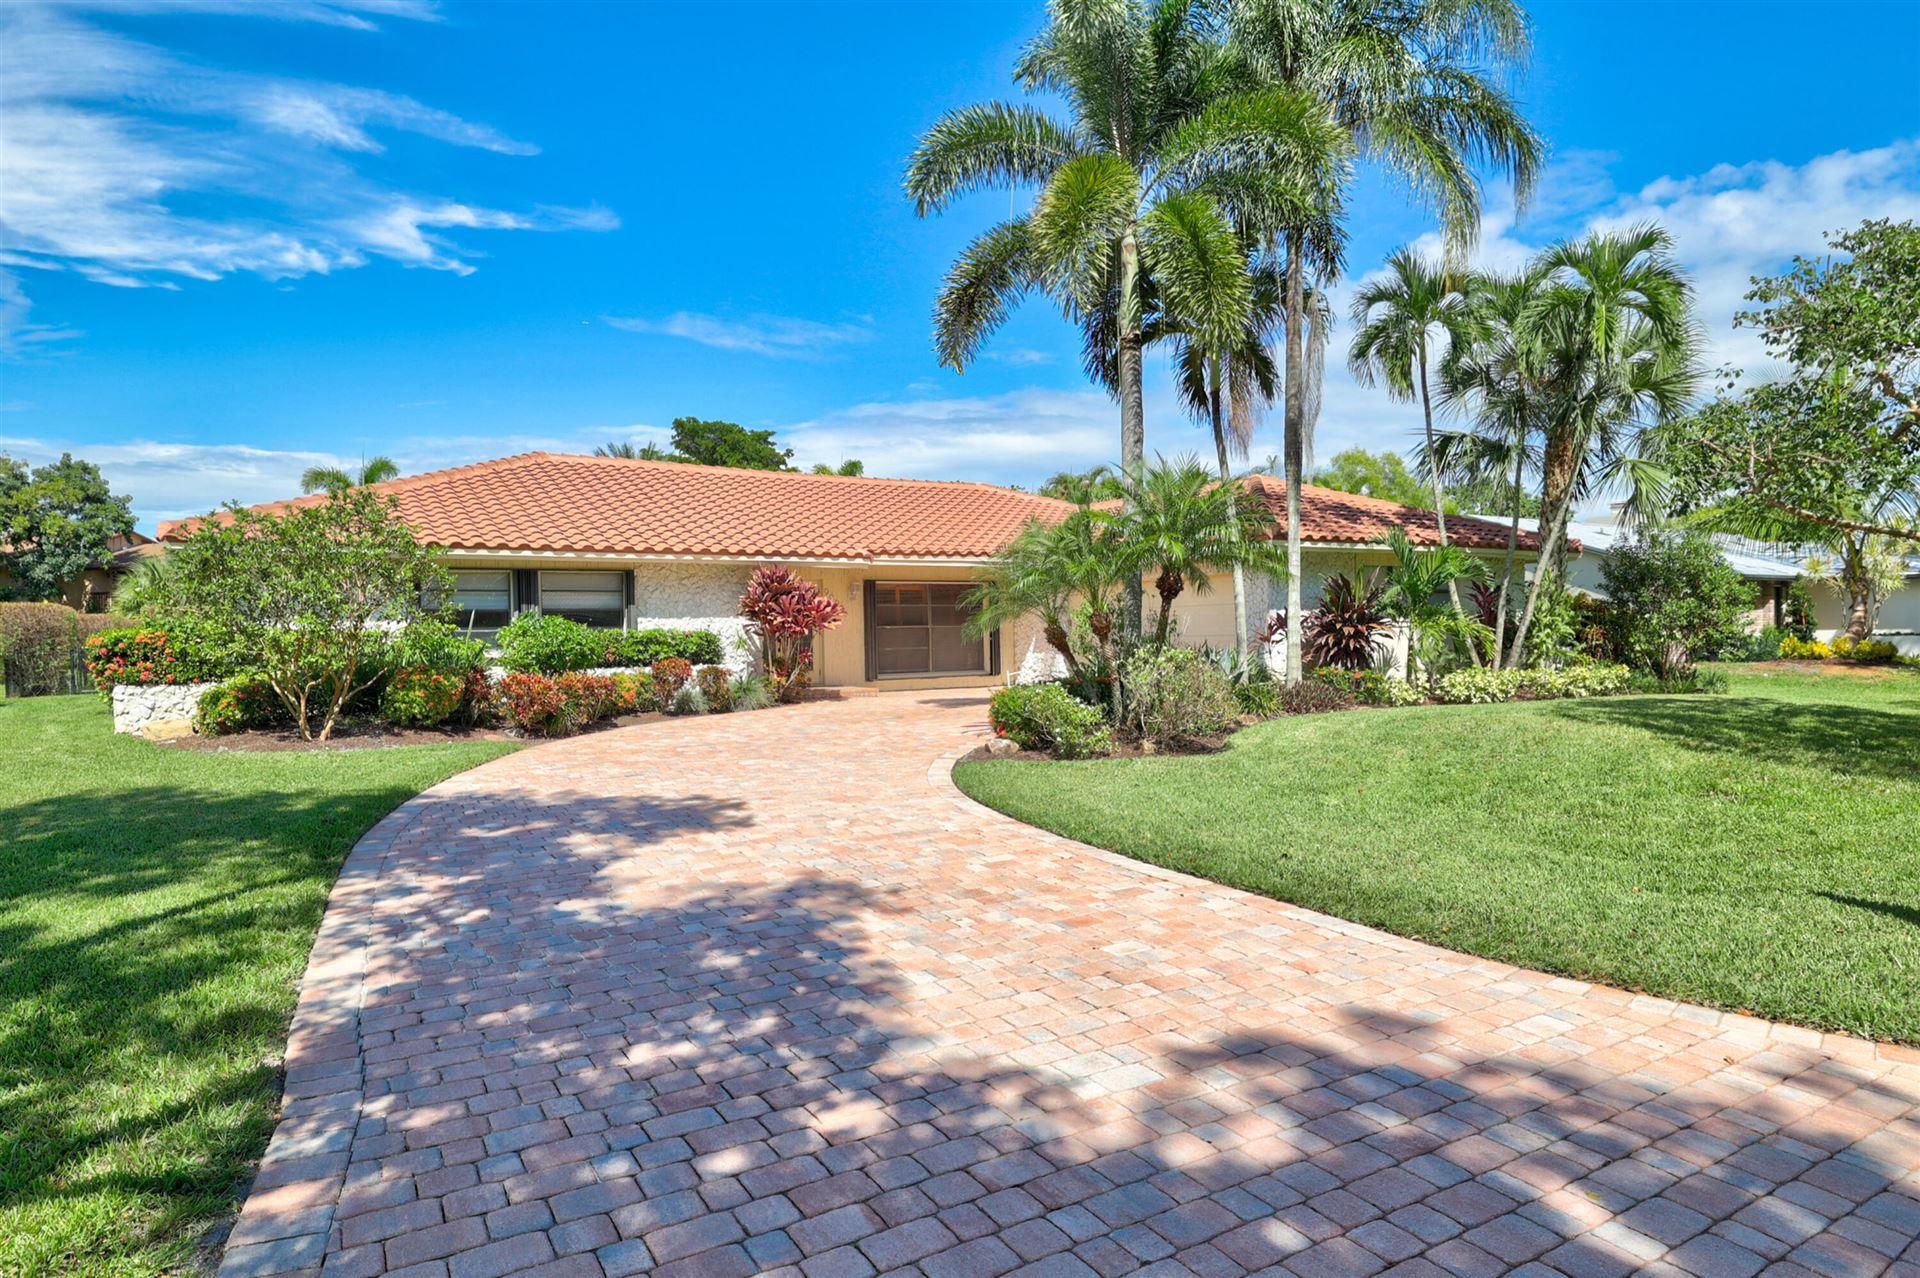 9999 NW 20th Street, Coral Springs, FL 33071 - MLS#: RX-10751994